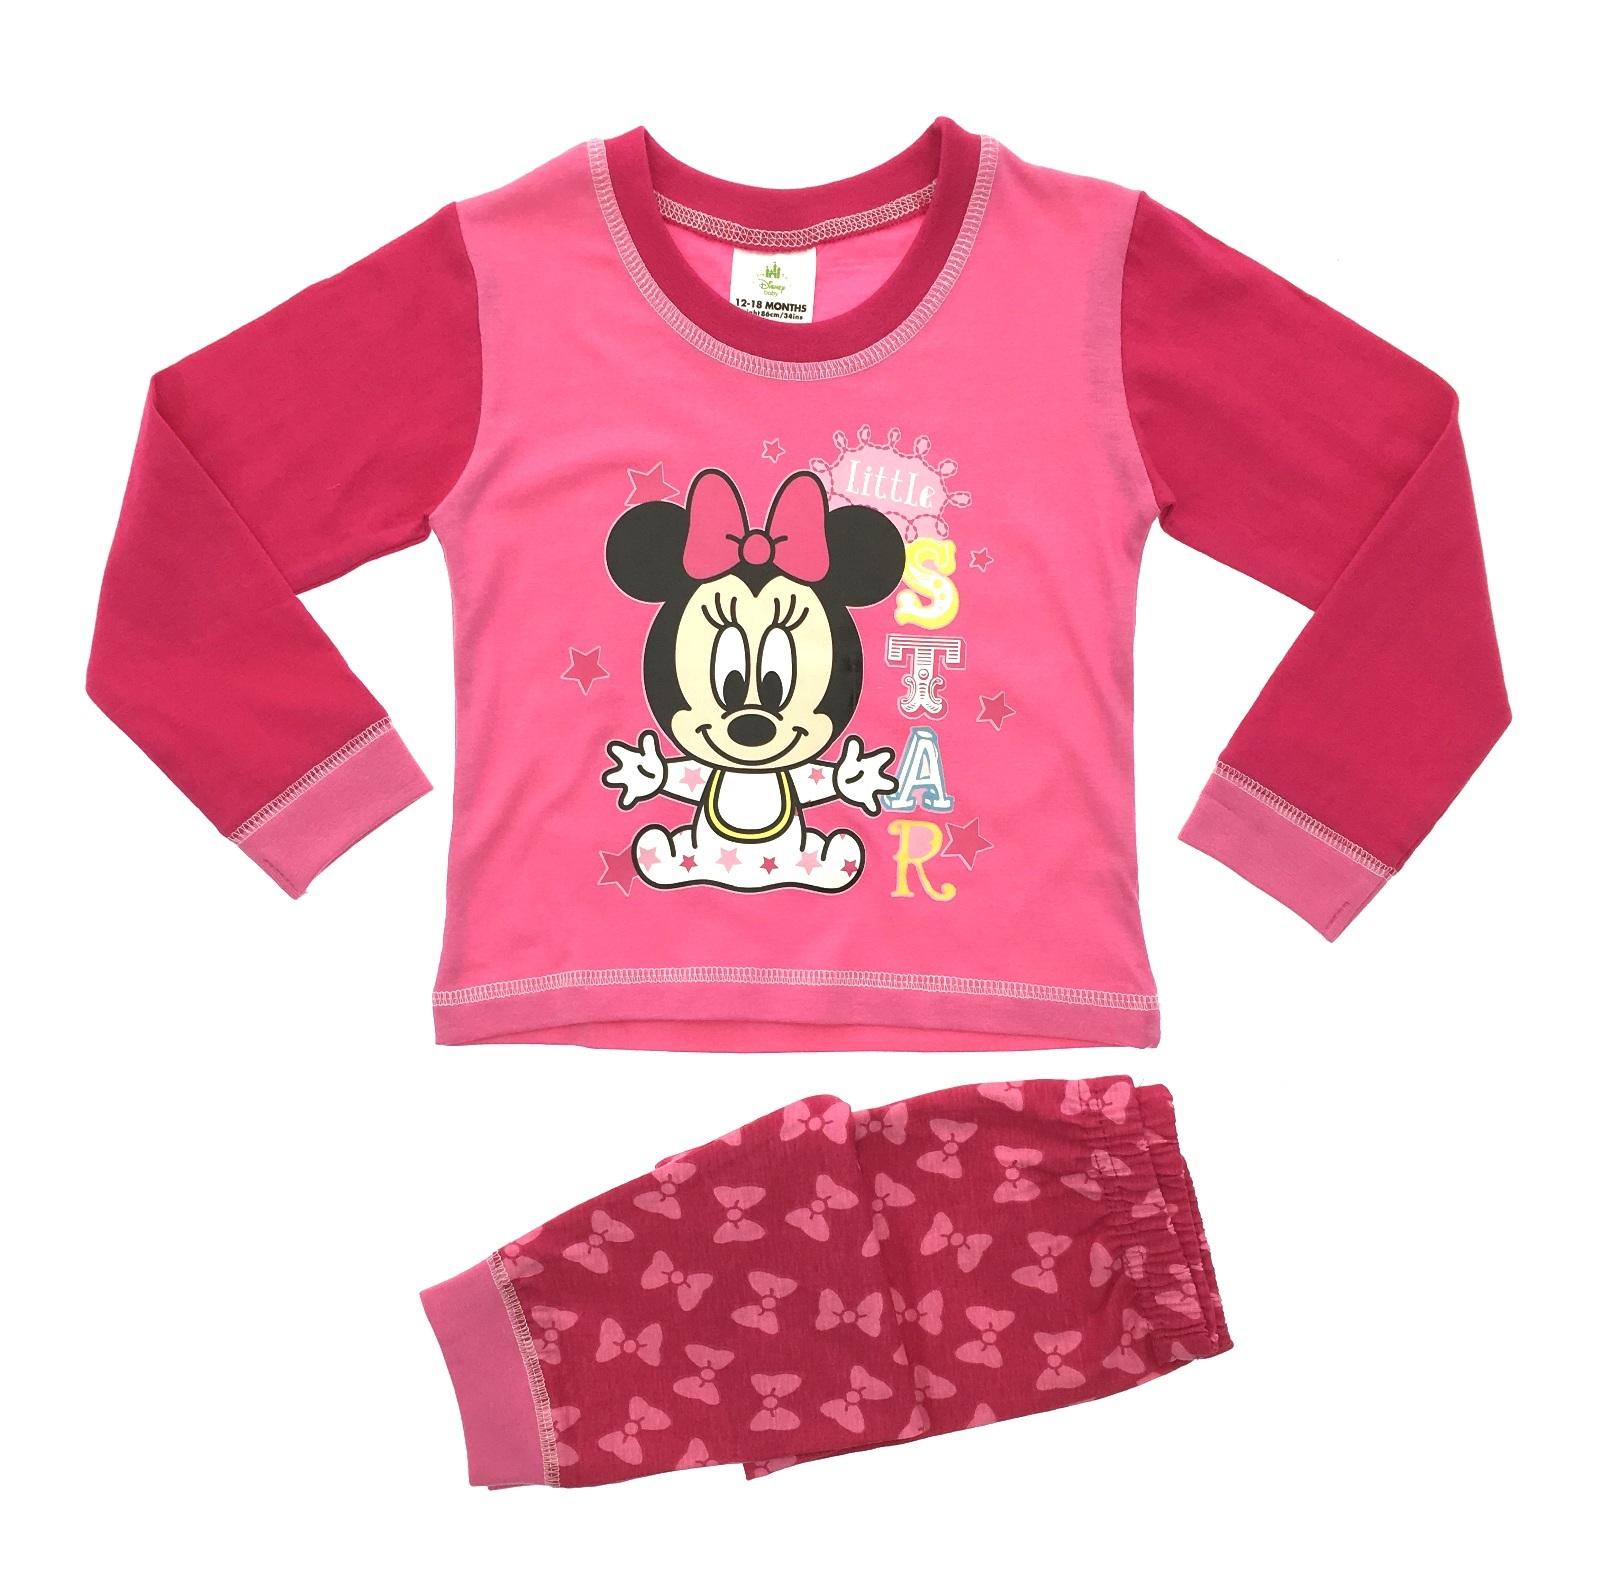 Baby Girls Pyjamas Kids Toddlers Disney Minnie Mouse Pjs Set Me To